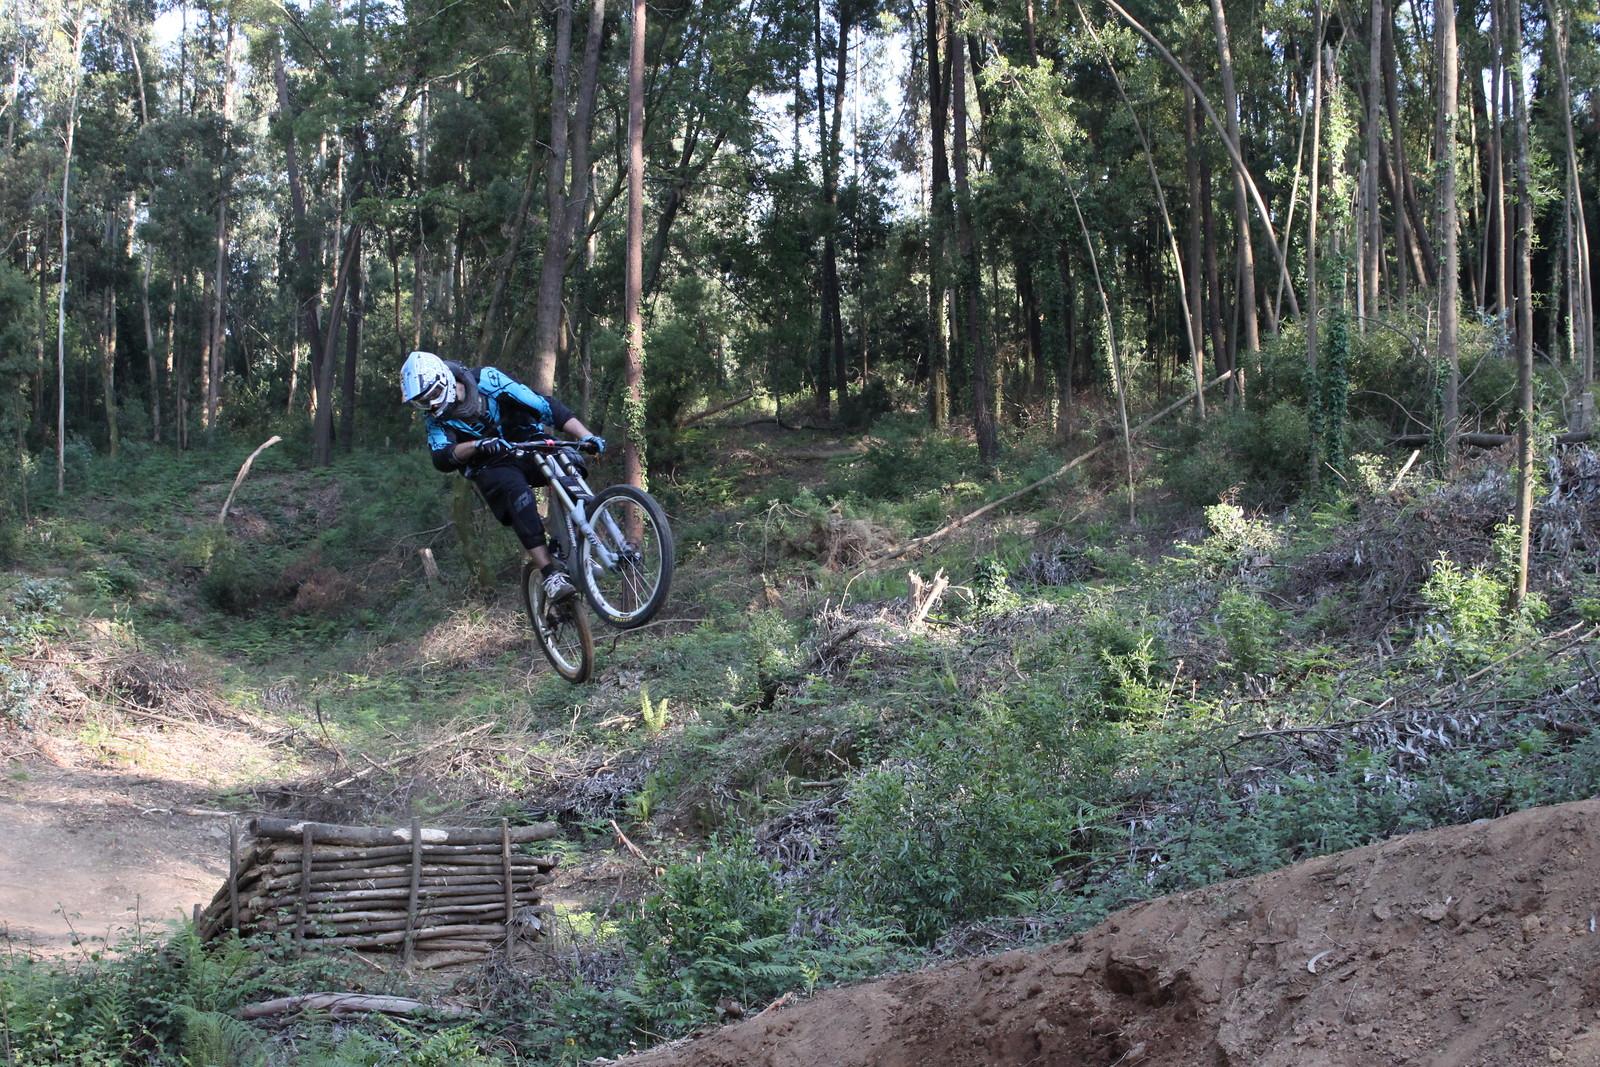 Big Gap Middle air - DoubleCrownKing - Mountain Biking Pictures - Vital MTB